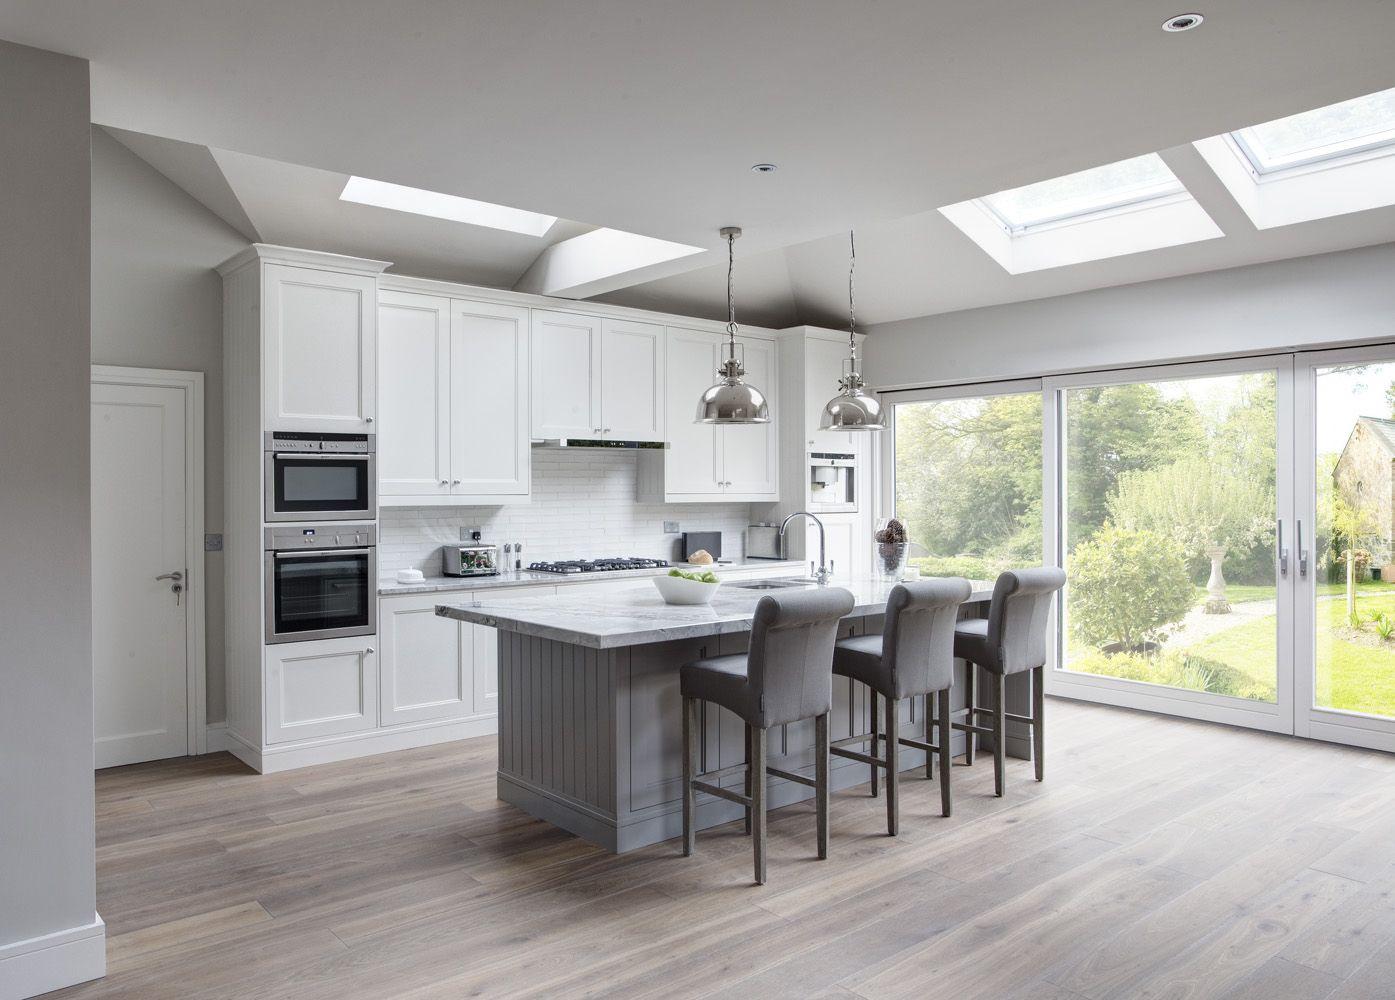 Top Kitchen Design And Organization Ideas In